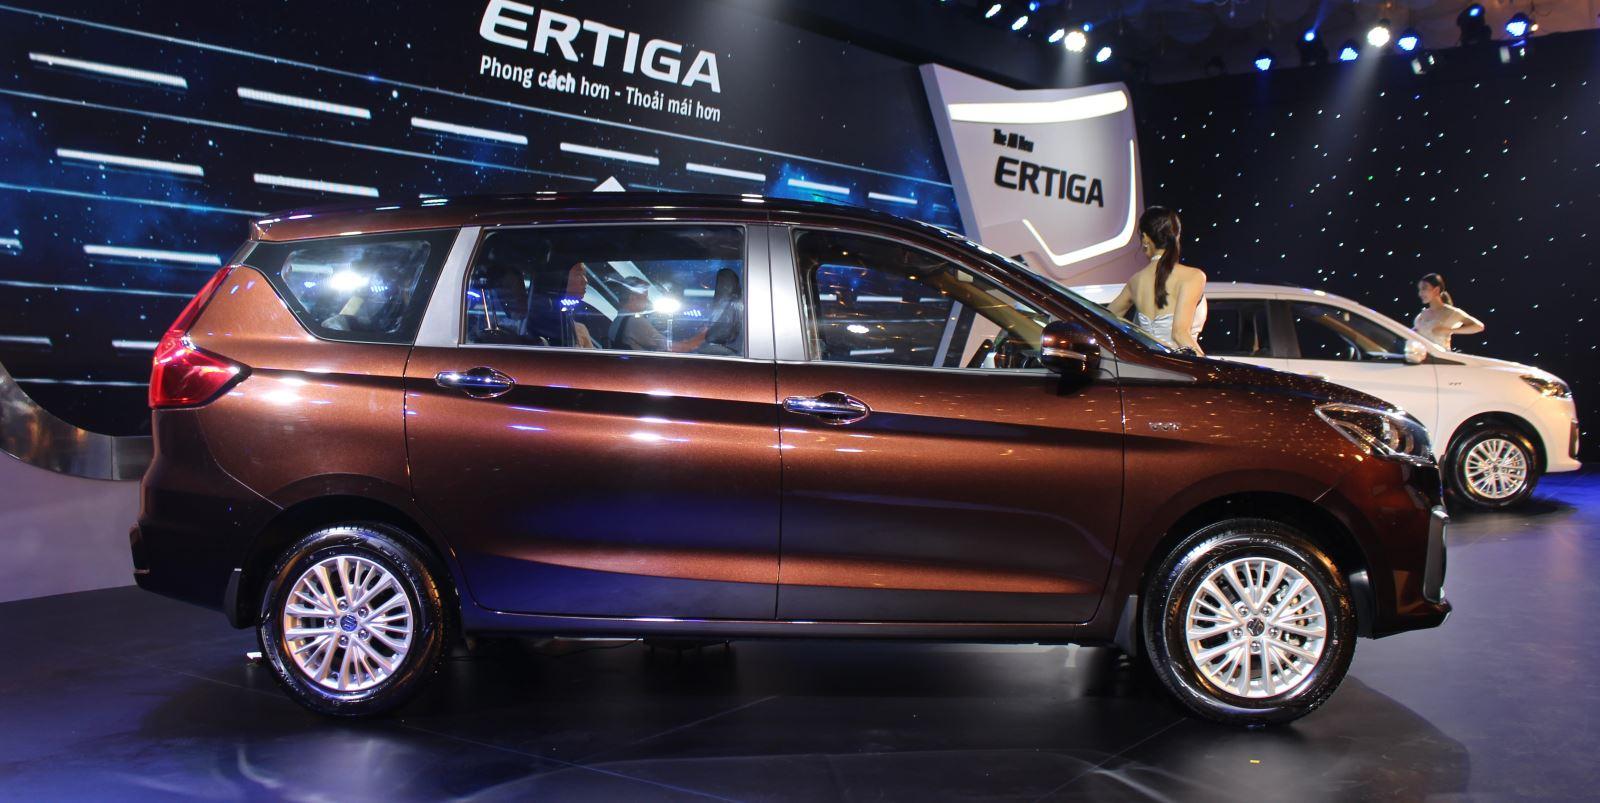 Giá tính lệ phí trước bạ của VinFast Fadil, Mazda CX-8, Suzuki Ertiga